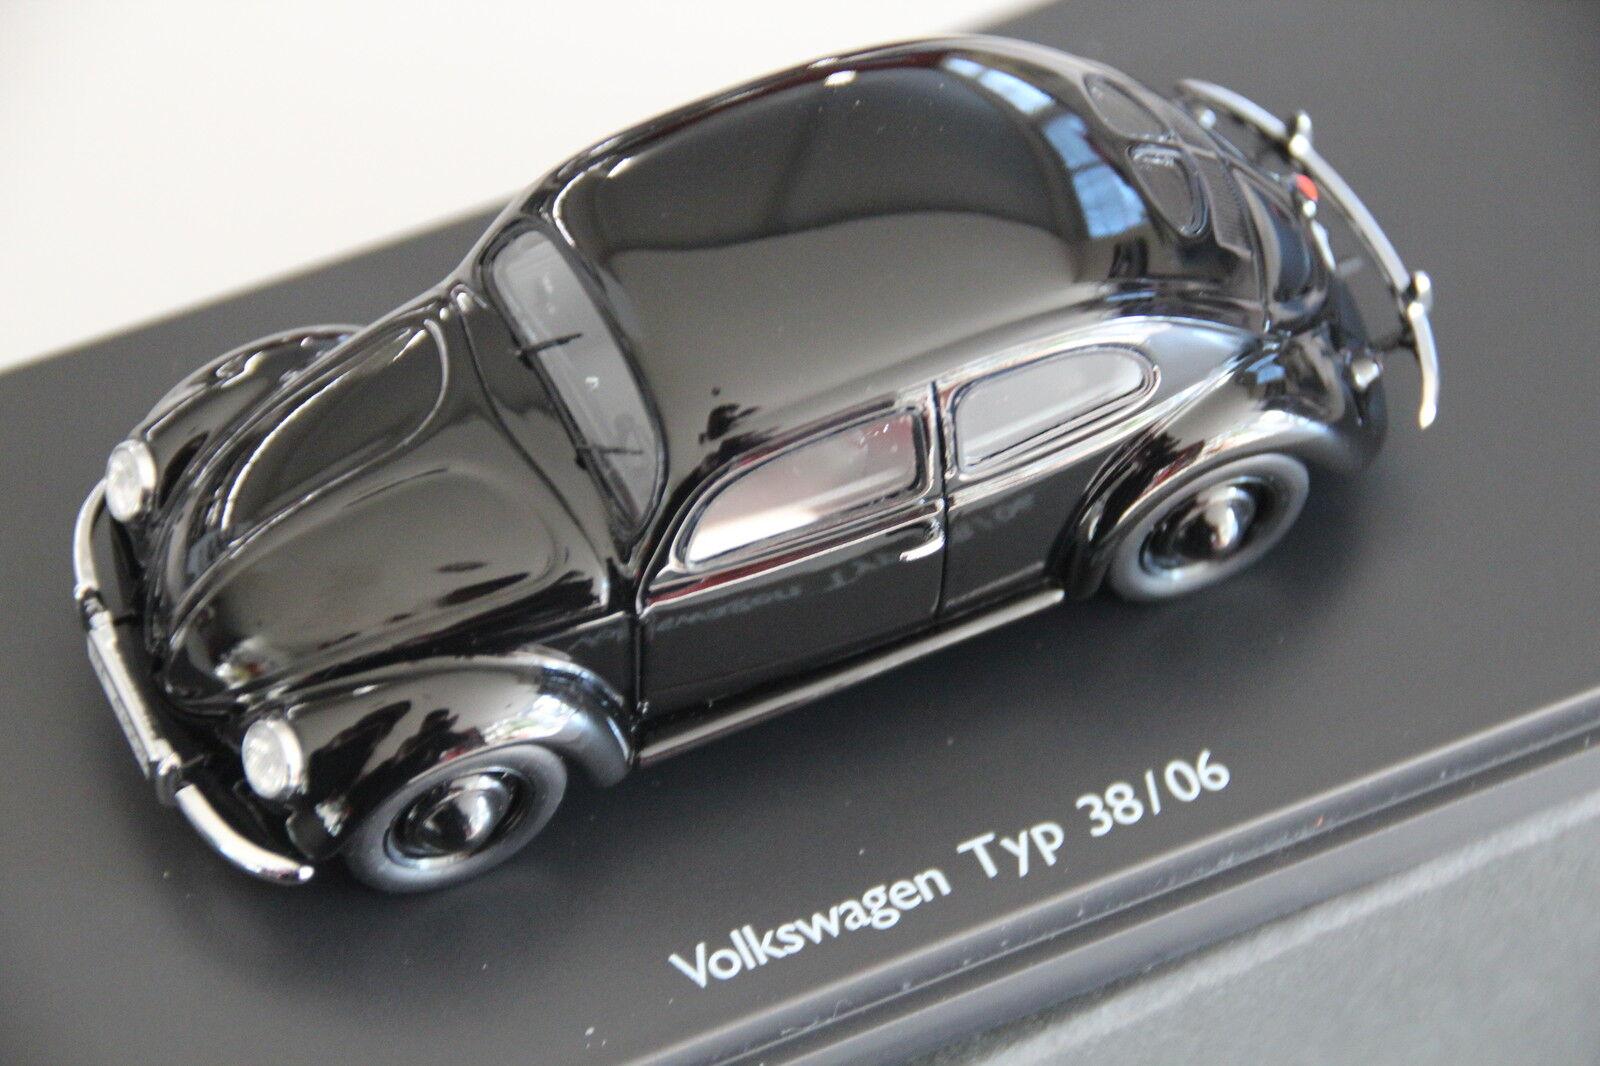 VW Käfer Brezel Brezelkäfer Typ 38 06 Schuco Pro.R Modellauto schwarz 1 43 NEU  | Neuheit Spielzeug